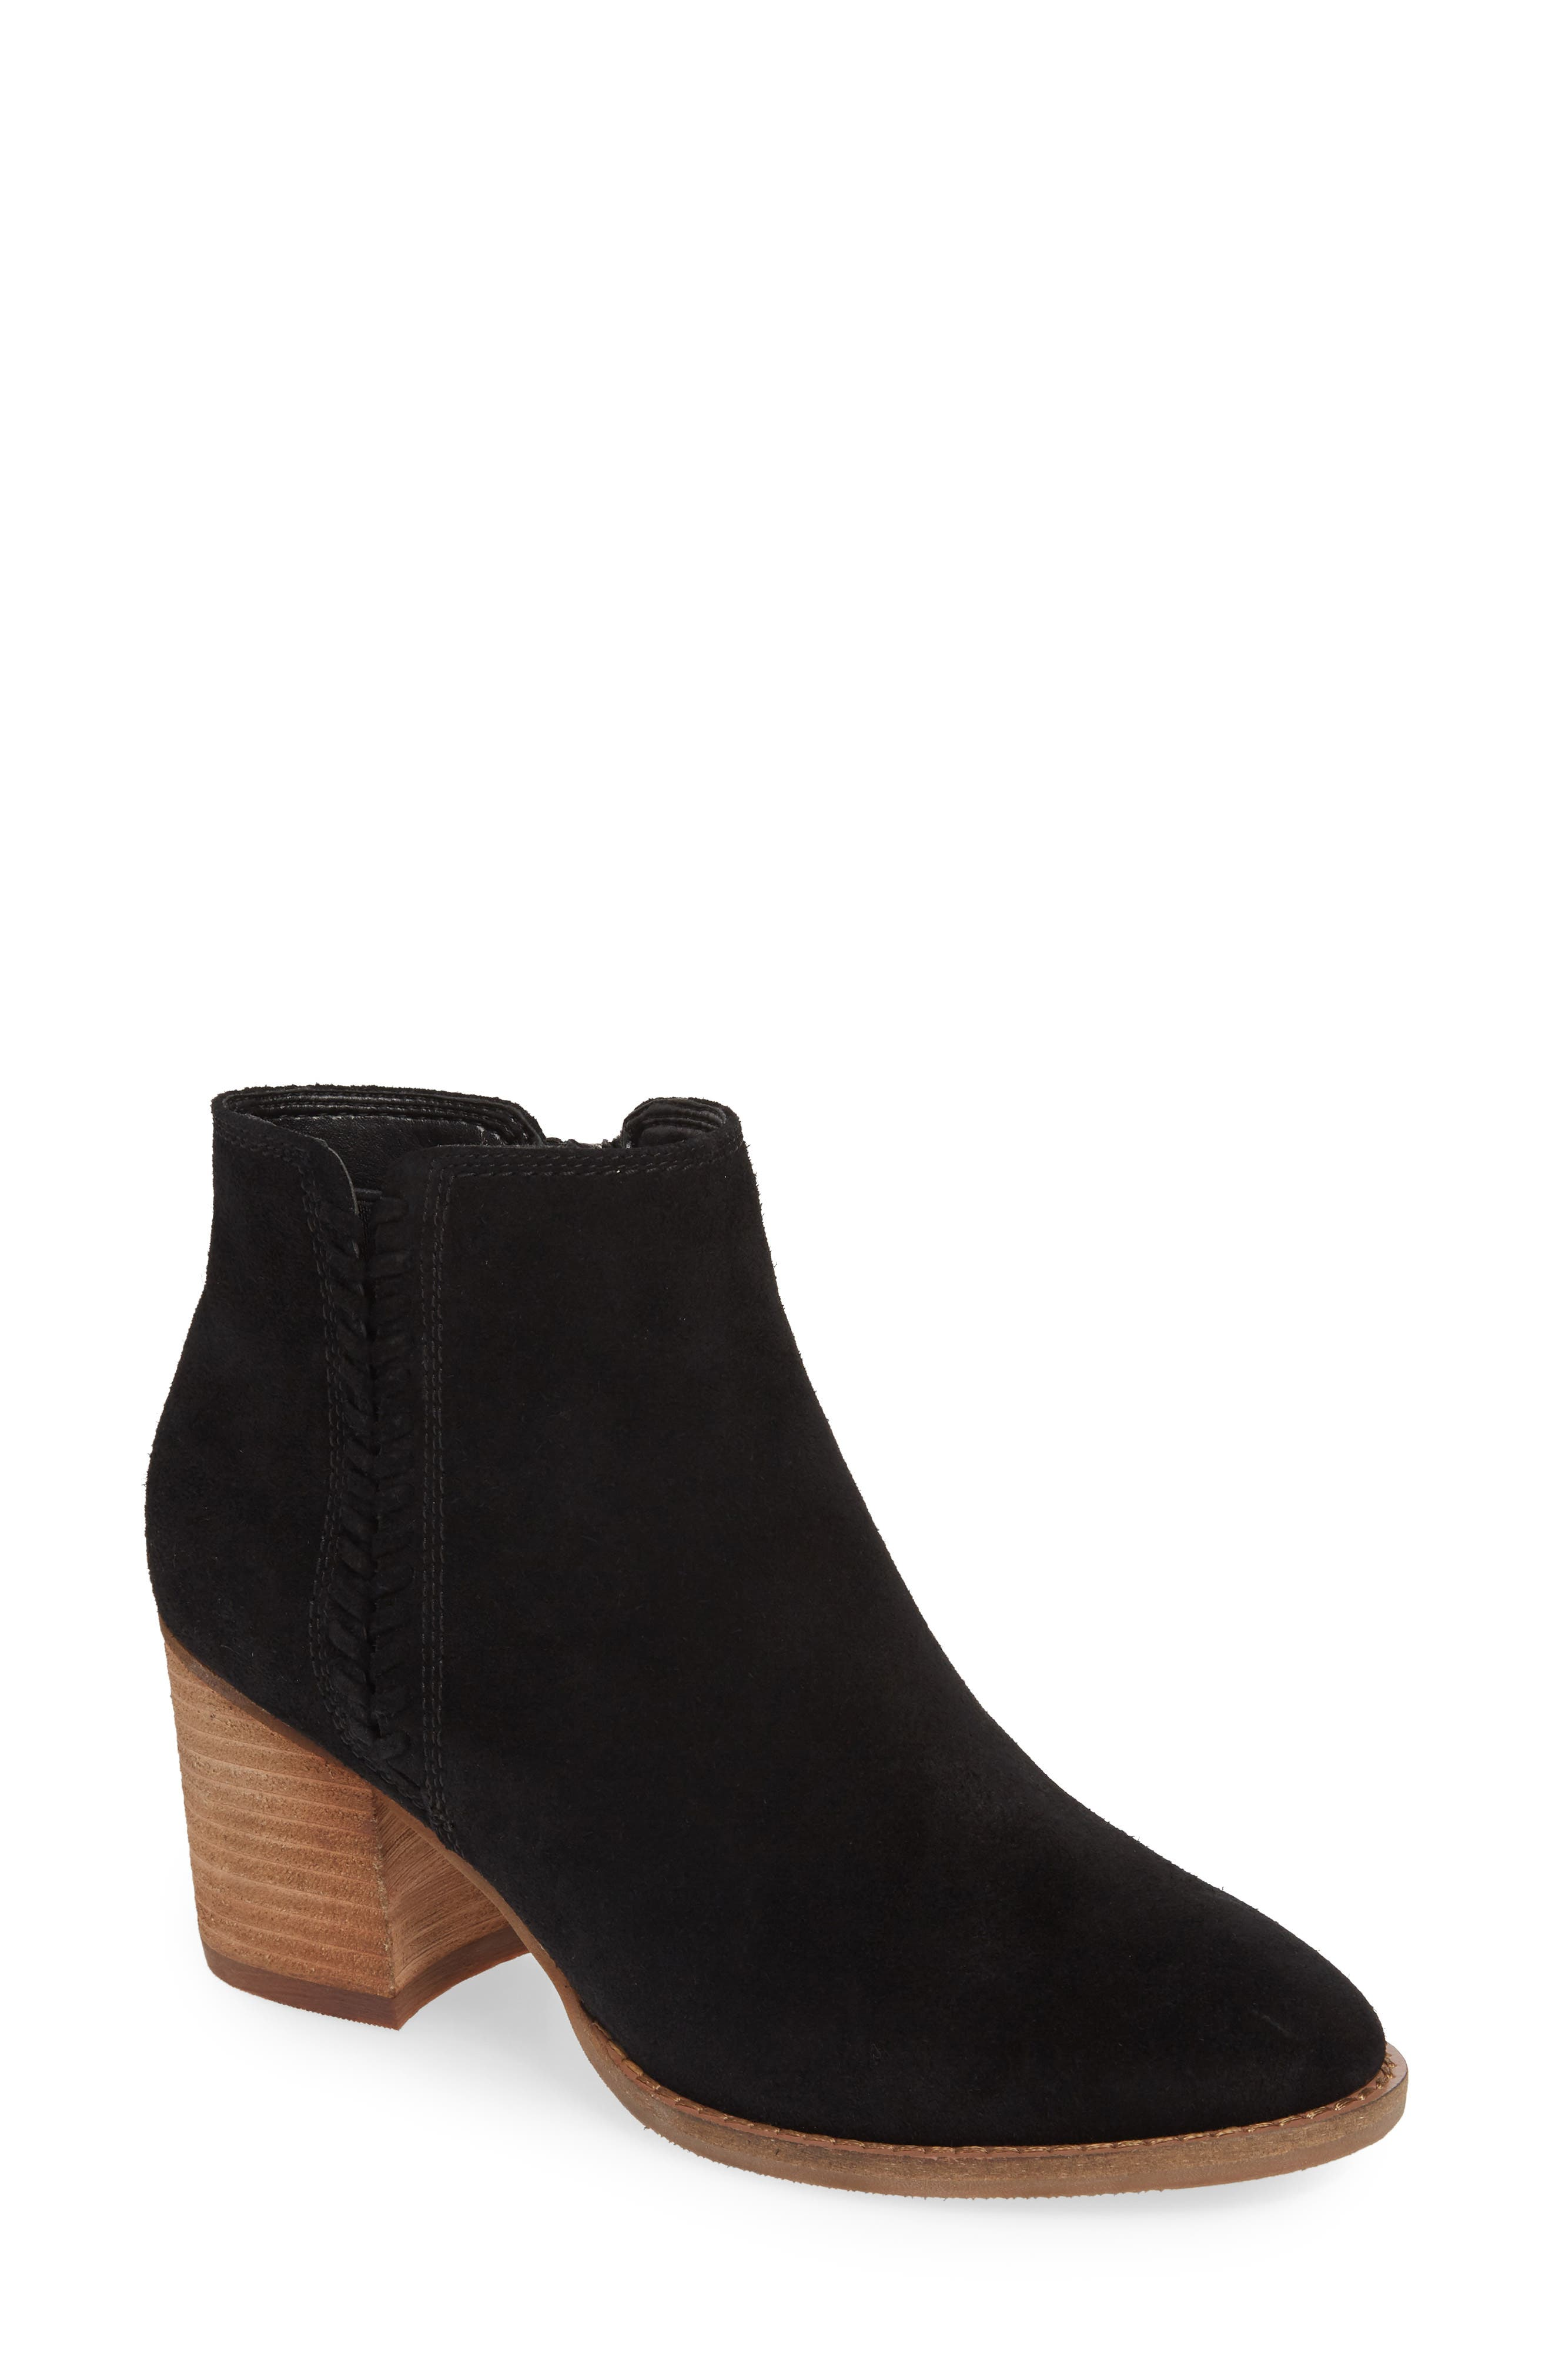 Image of Blondo Nina Waterproof Suede Boot